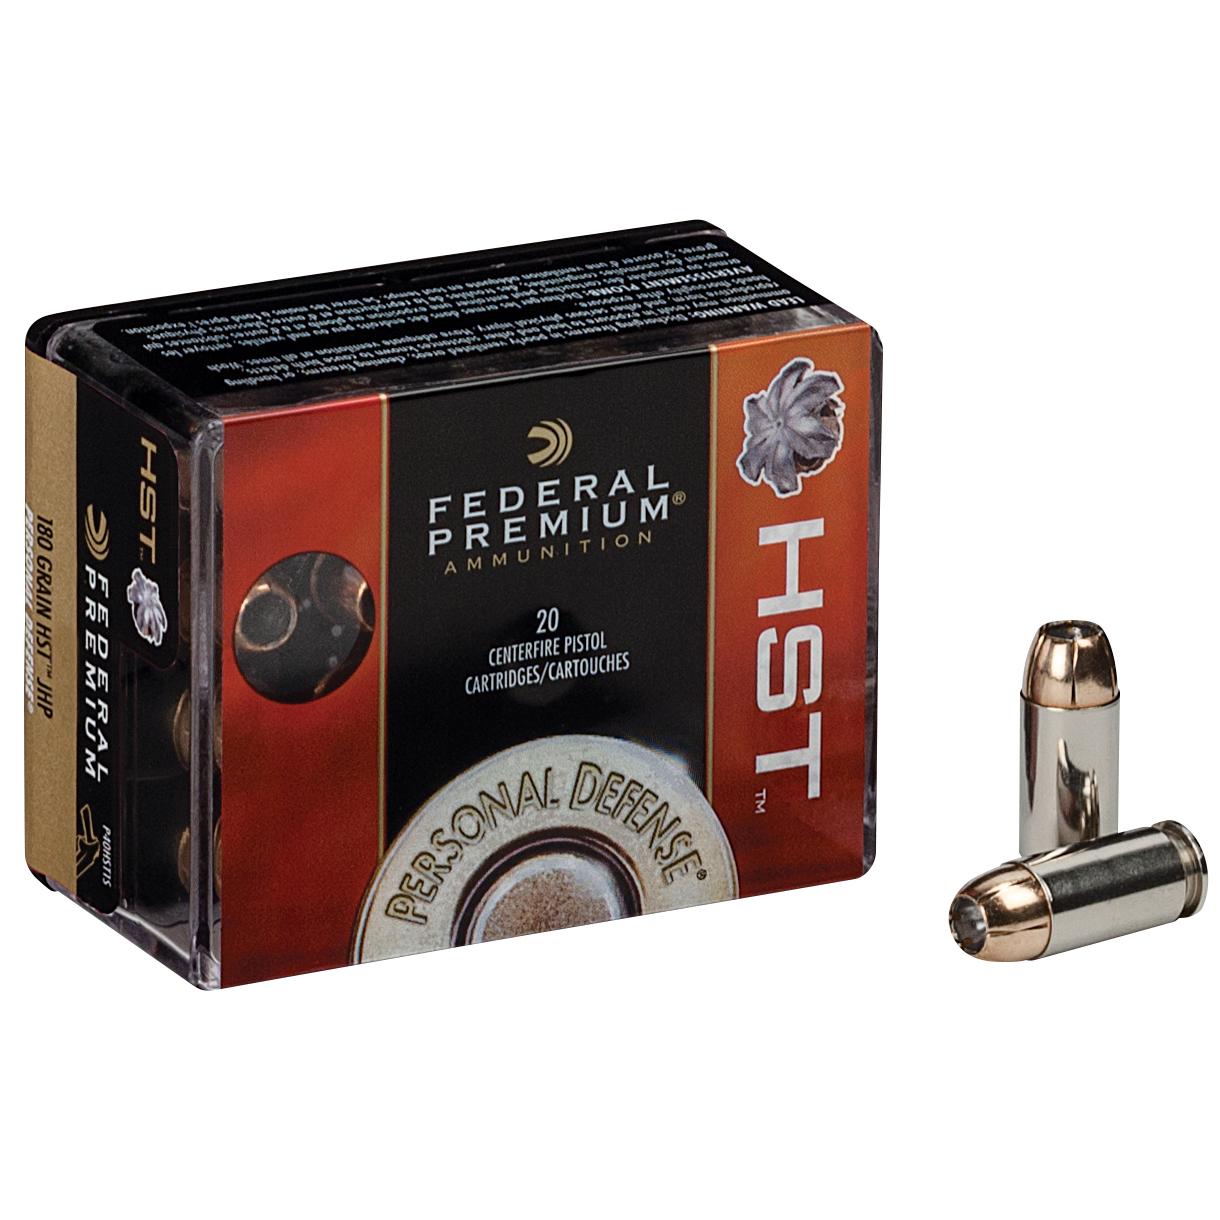 Federal Premium Personal Defense Handgun Ammo, .45 ACP, 230-gr, HST-JHP